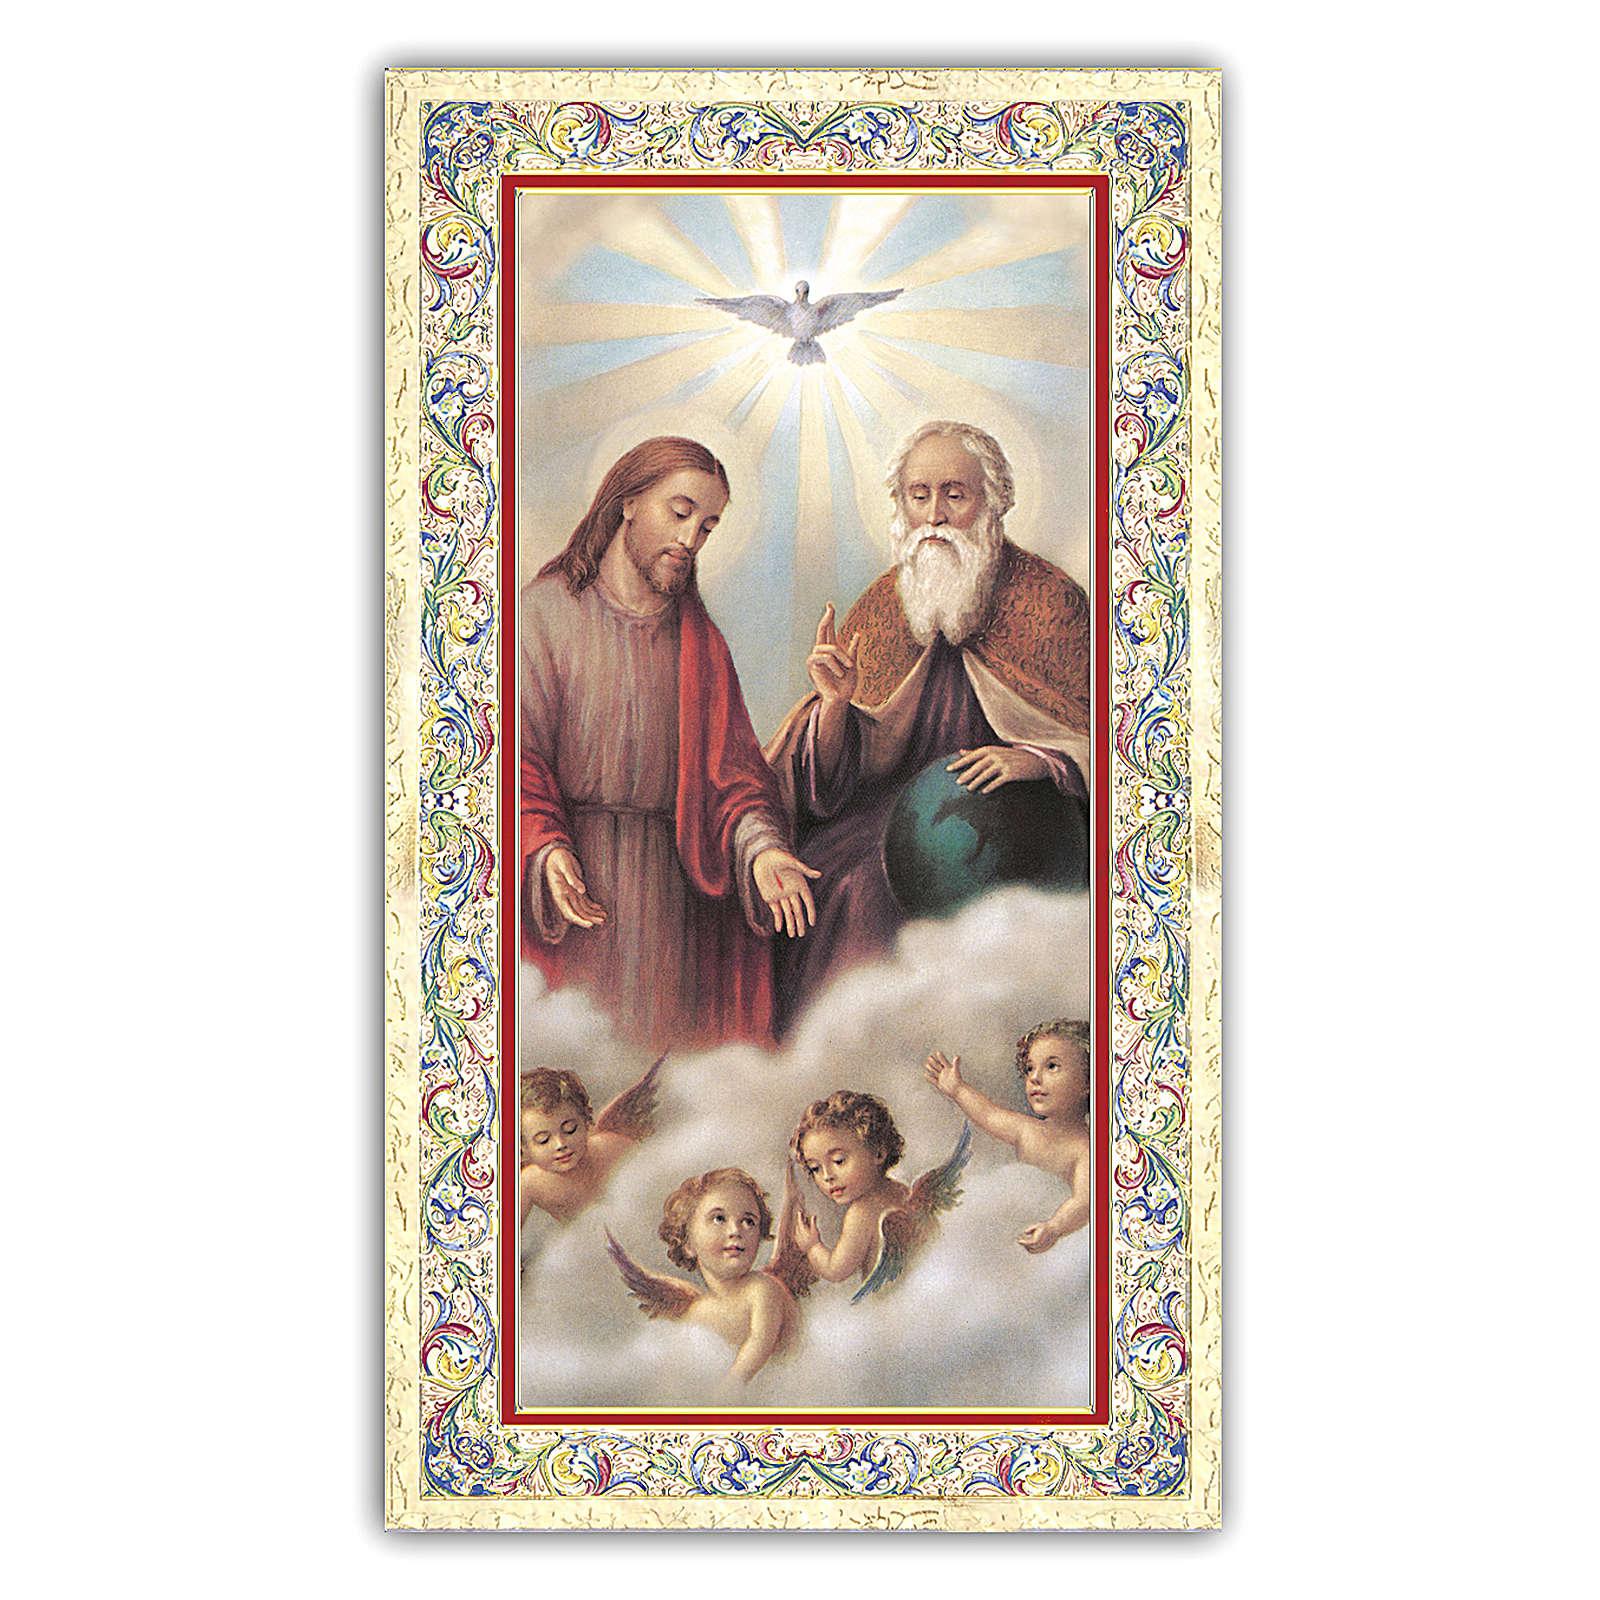 Santino Santissima Trinità 10x5 cm ITA 4